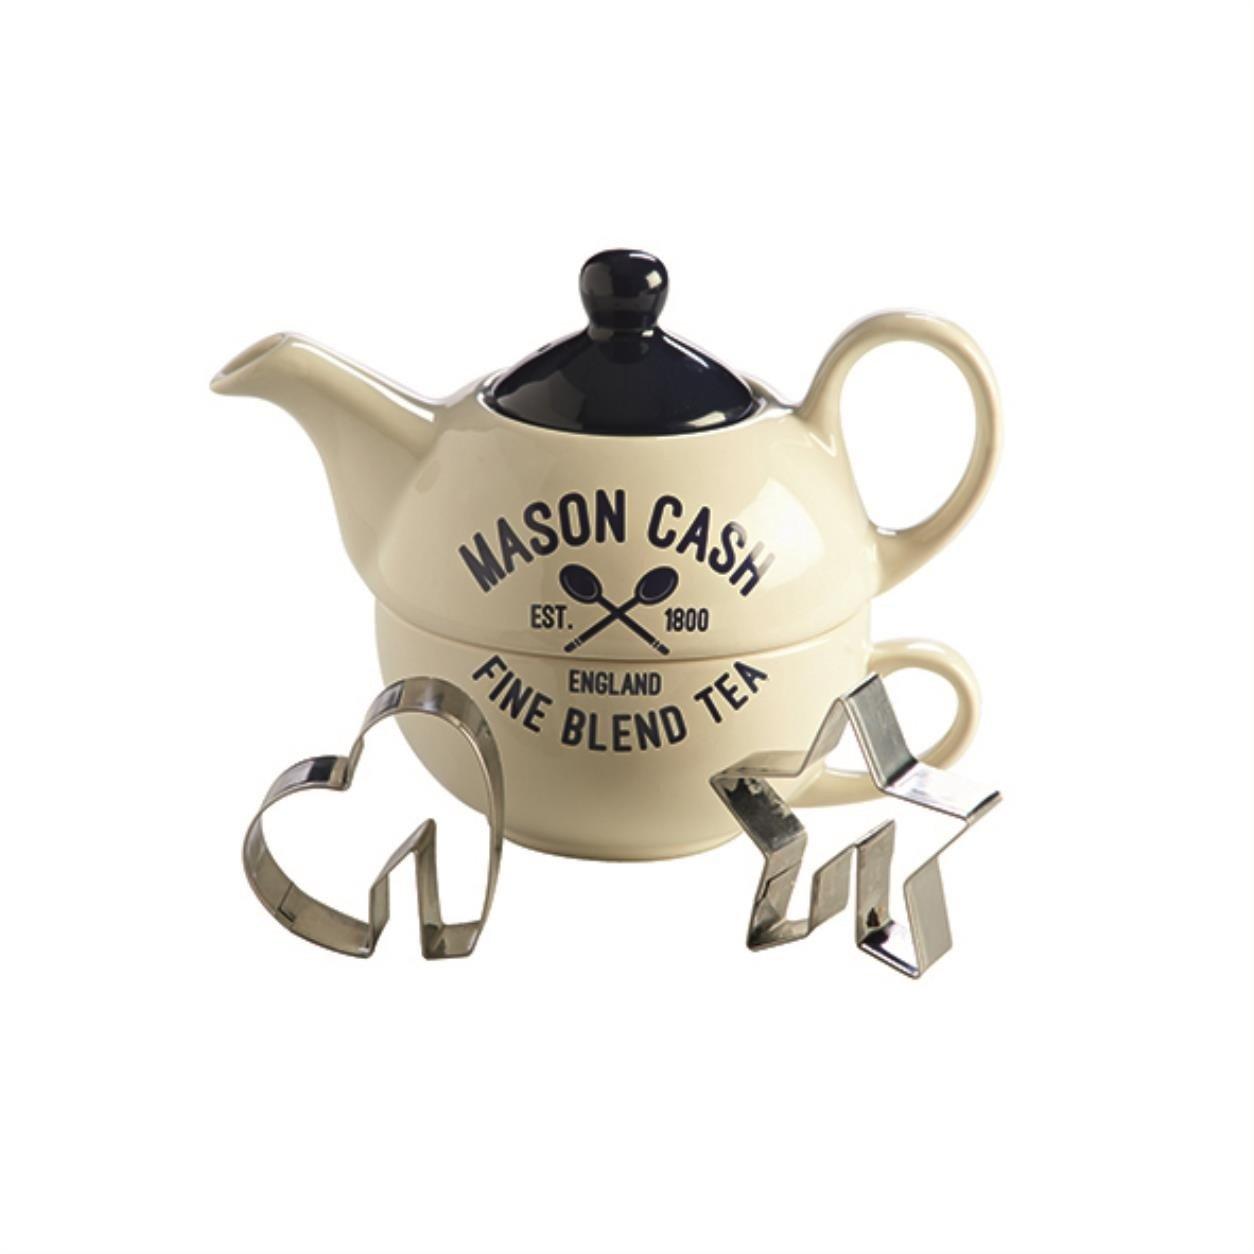 Mason Cash Teekannen-Set Tea for One Teekanne mit 2 Ausstecher, Edelstahl, Keramik, Weiß , 14,5 x 11,5 x 12,5 cm 2001.745